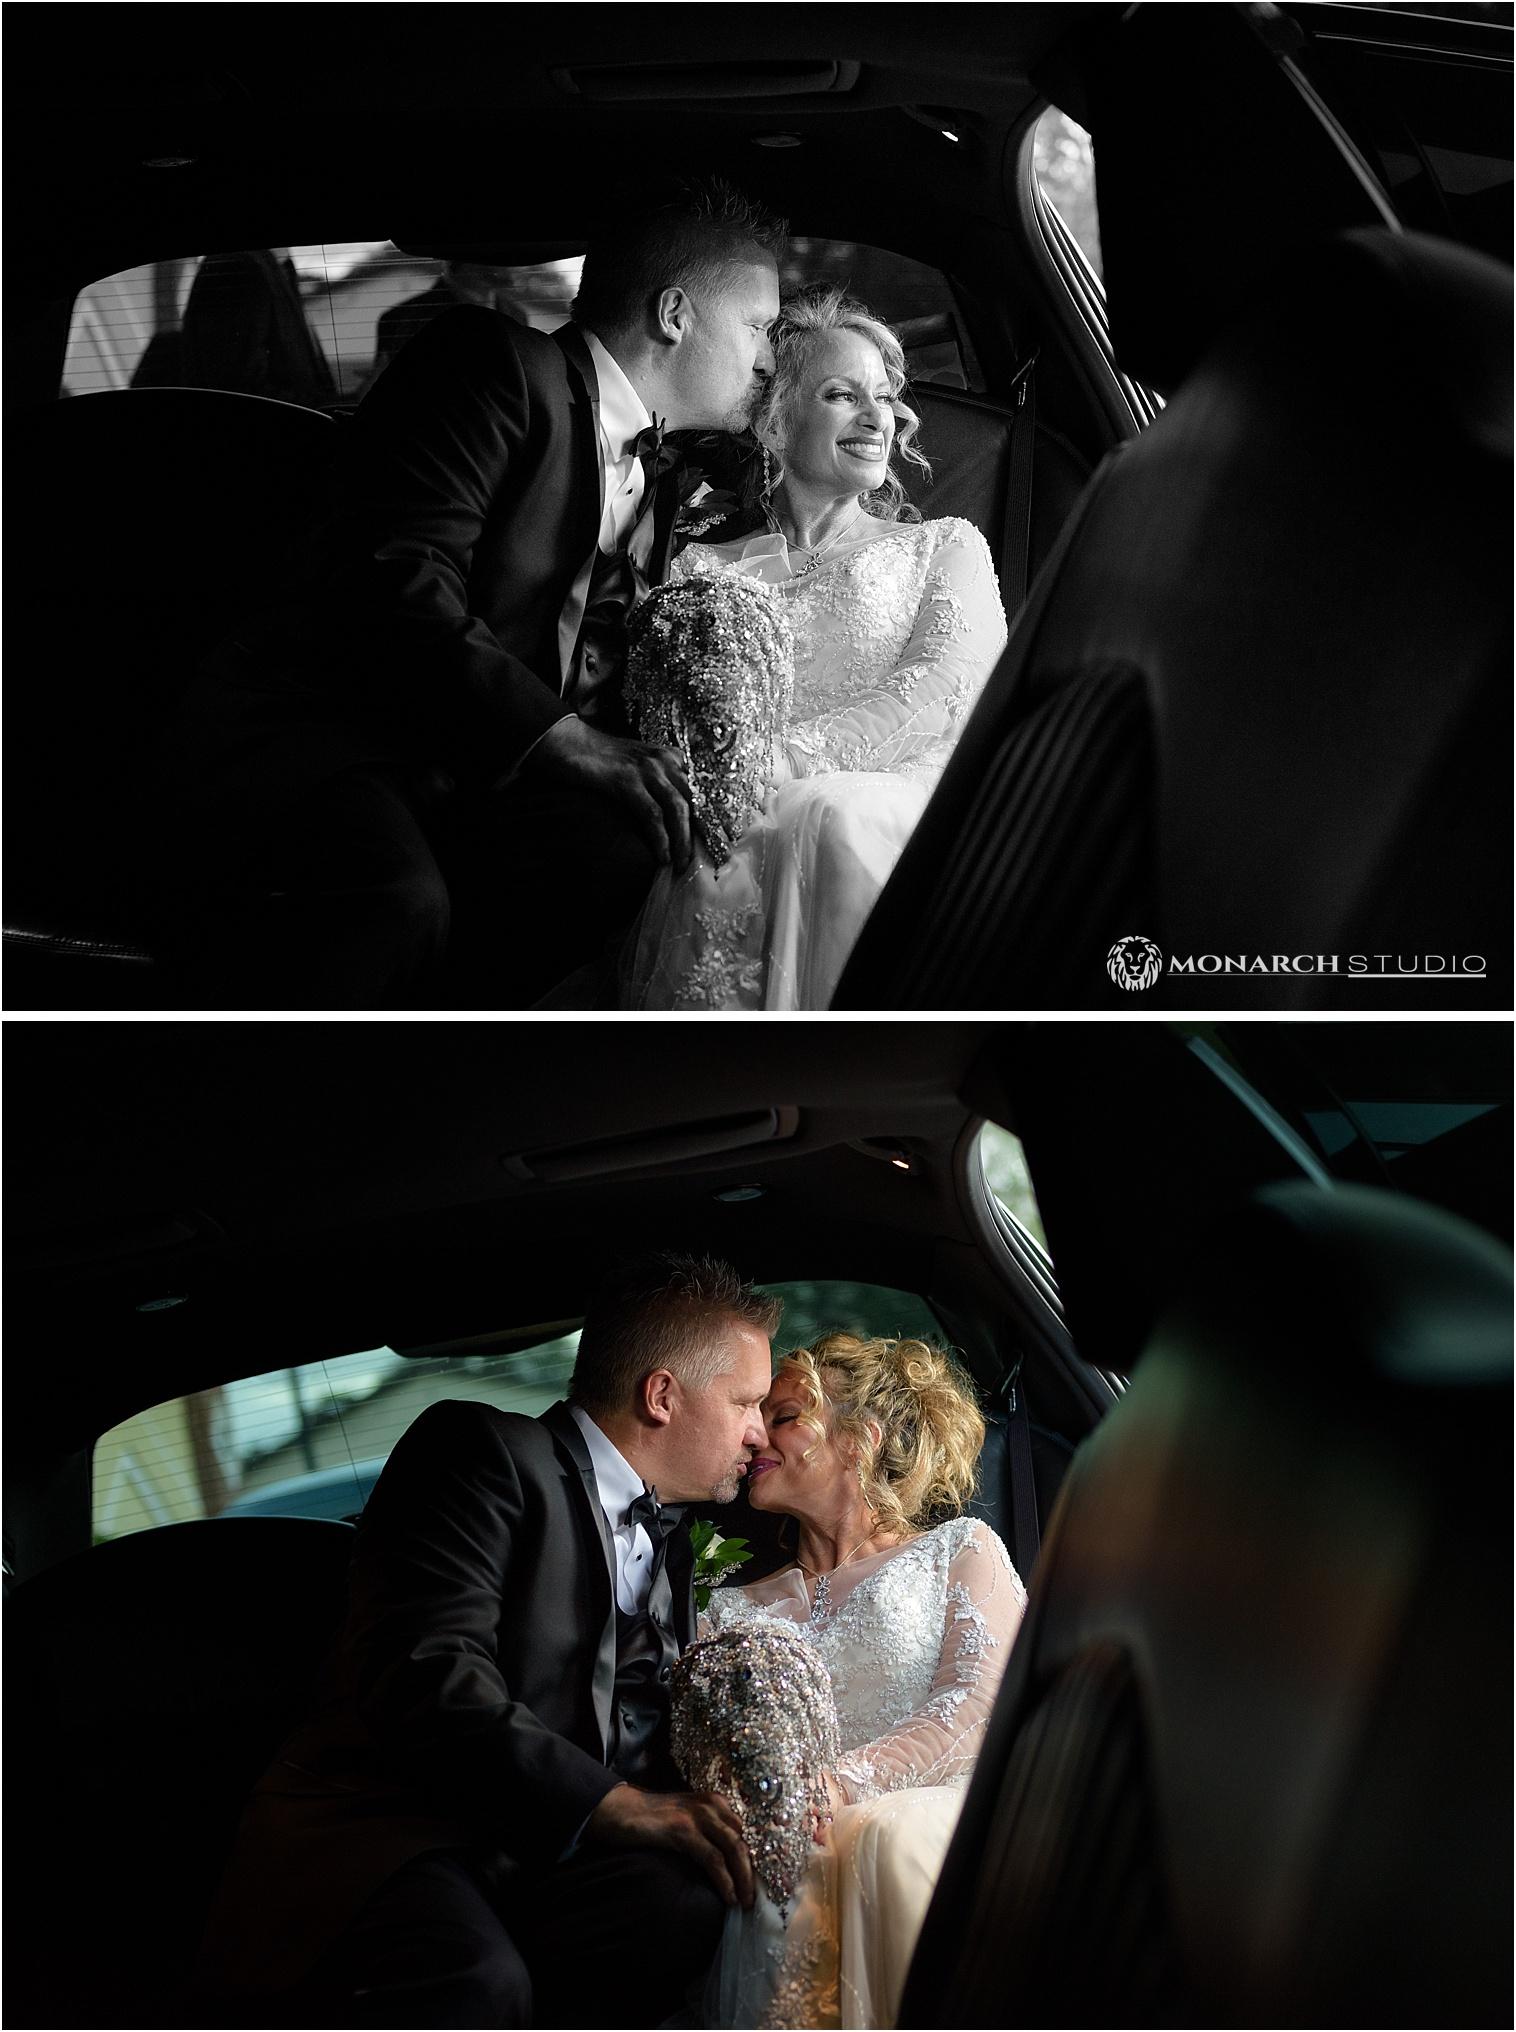 ponte-vedra-wedding-photographer-tpc075.jpg